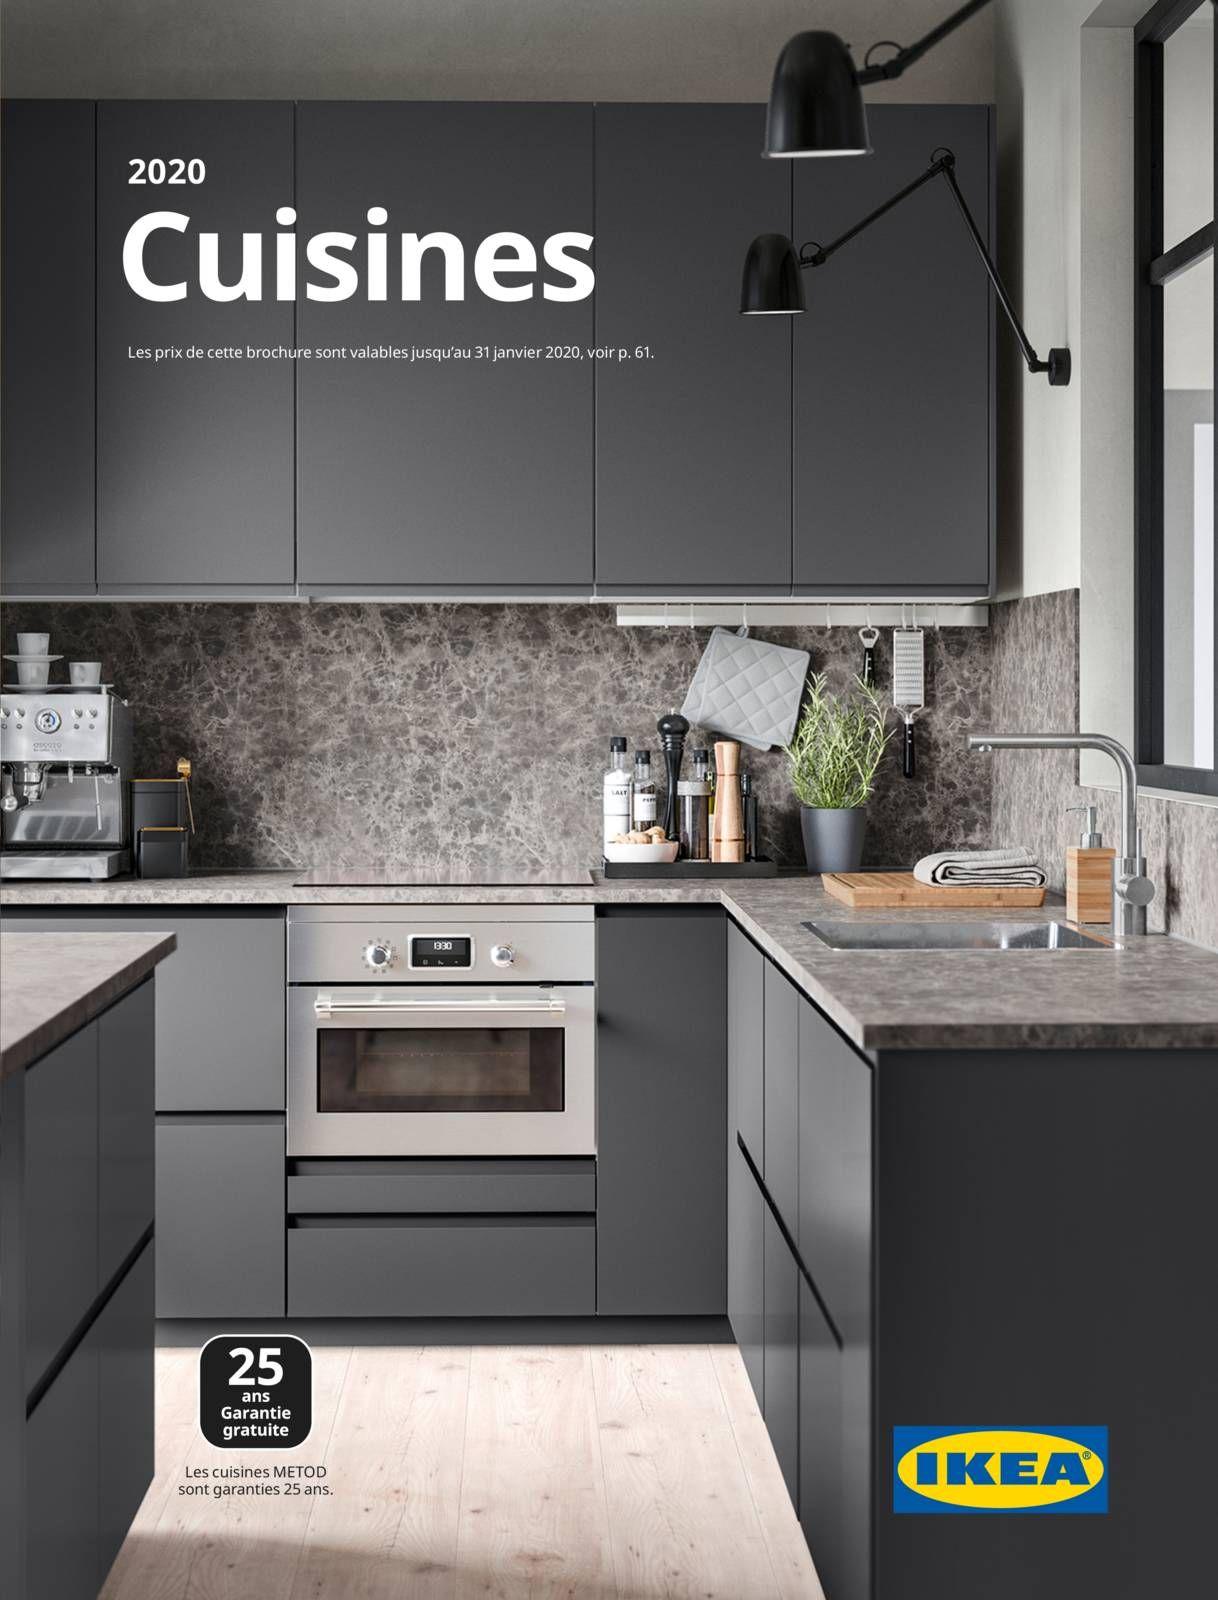 brochure cuisines ikea 2020